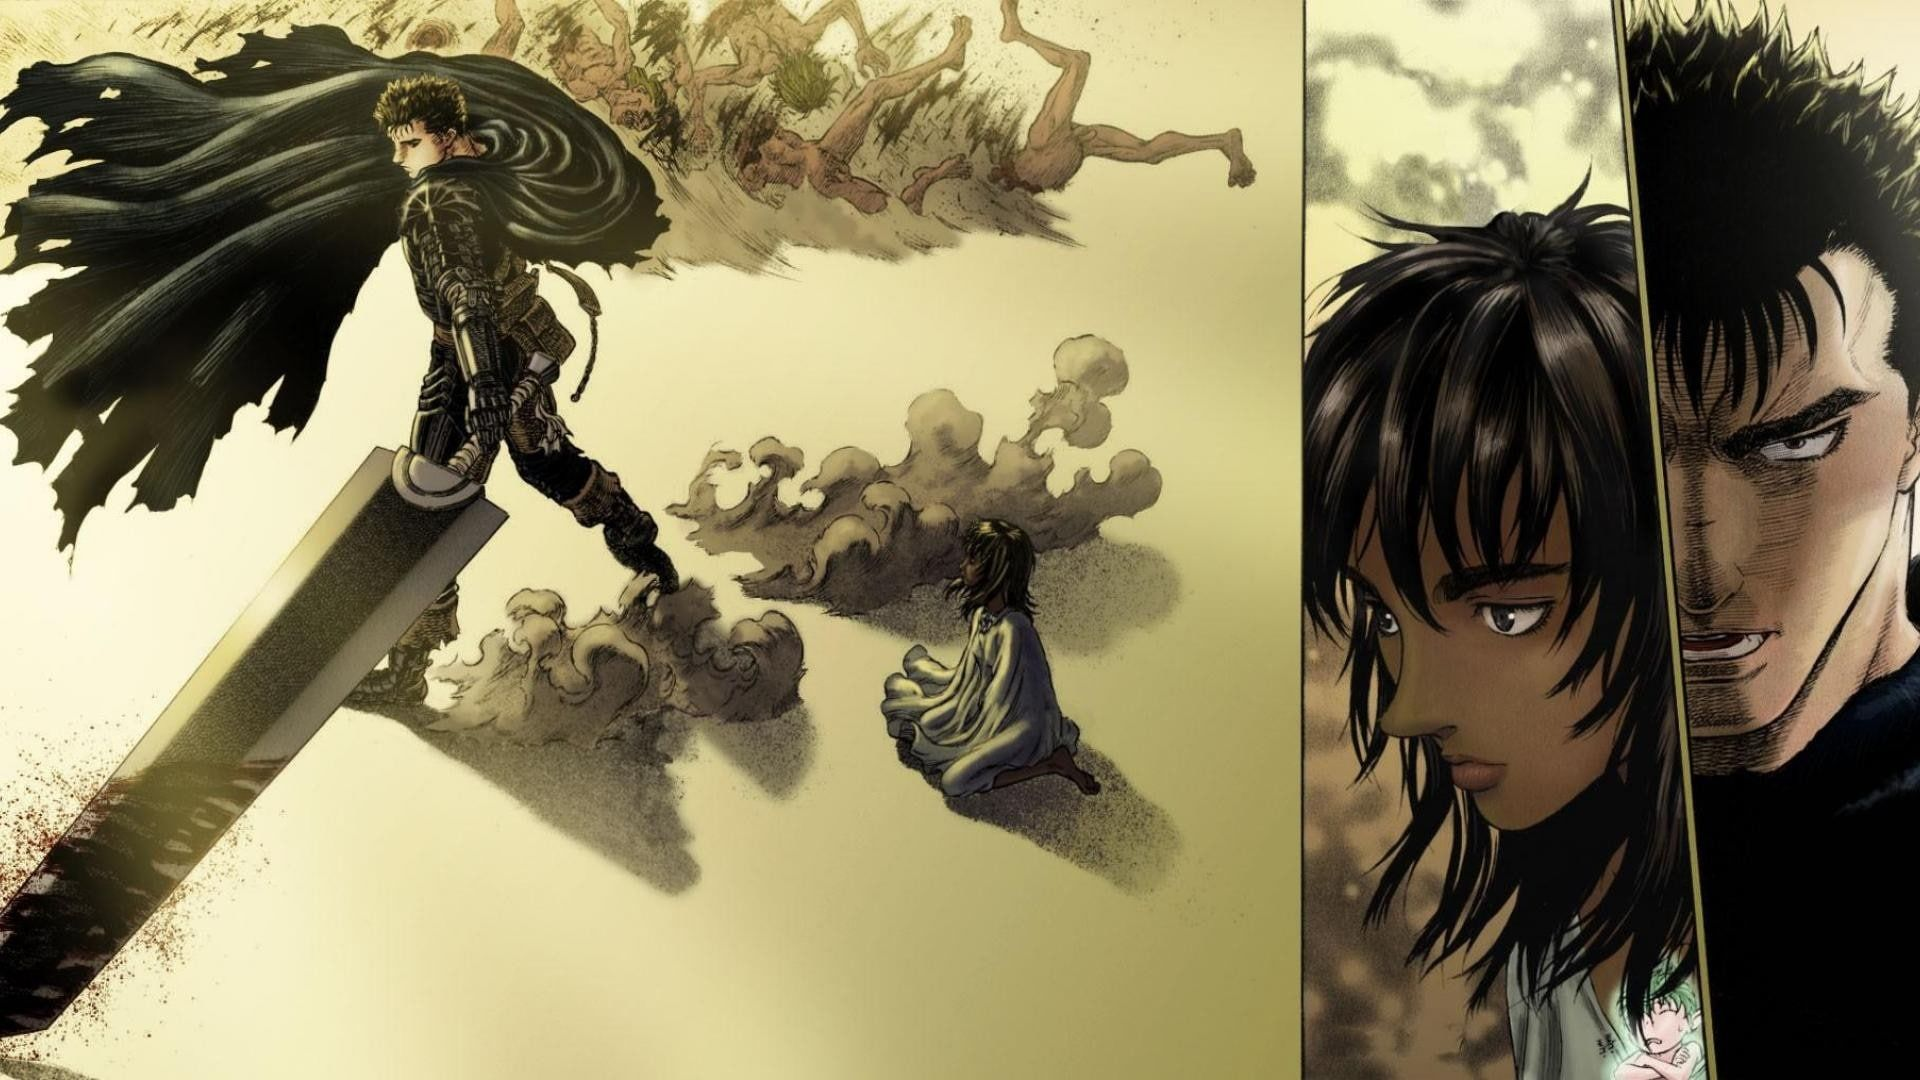 Berserk Kentaro Miura Guts Casca 1080P wallpaper